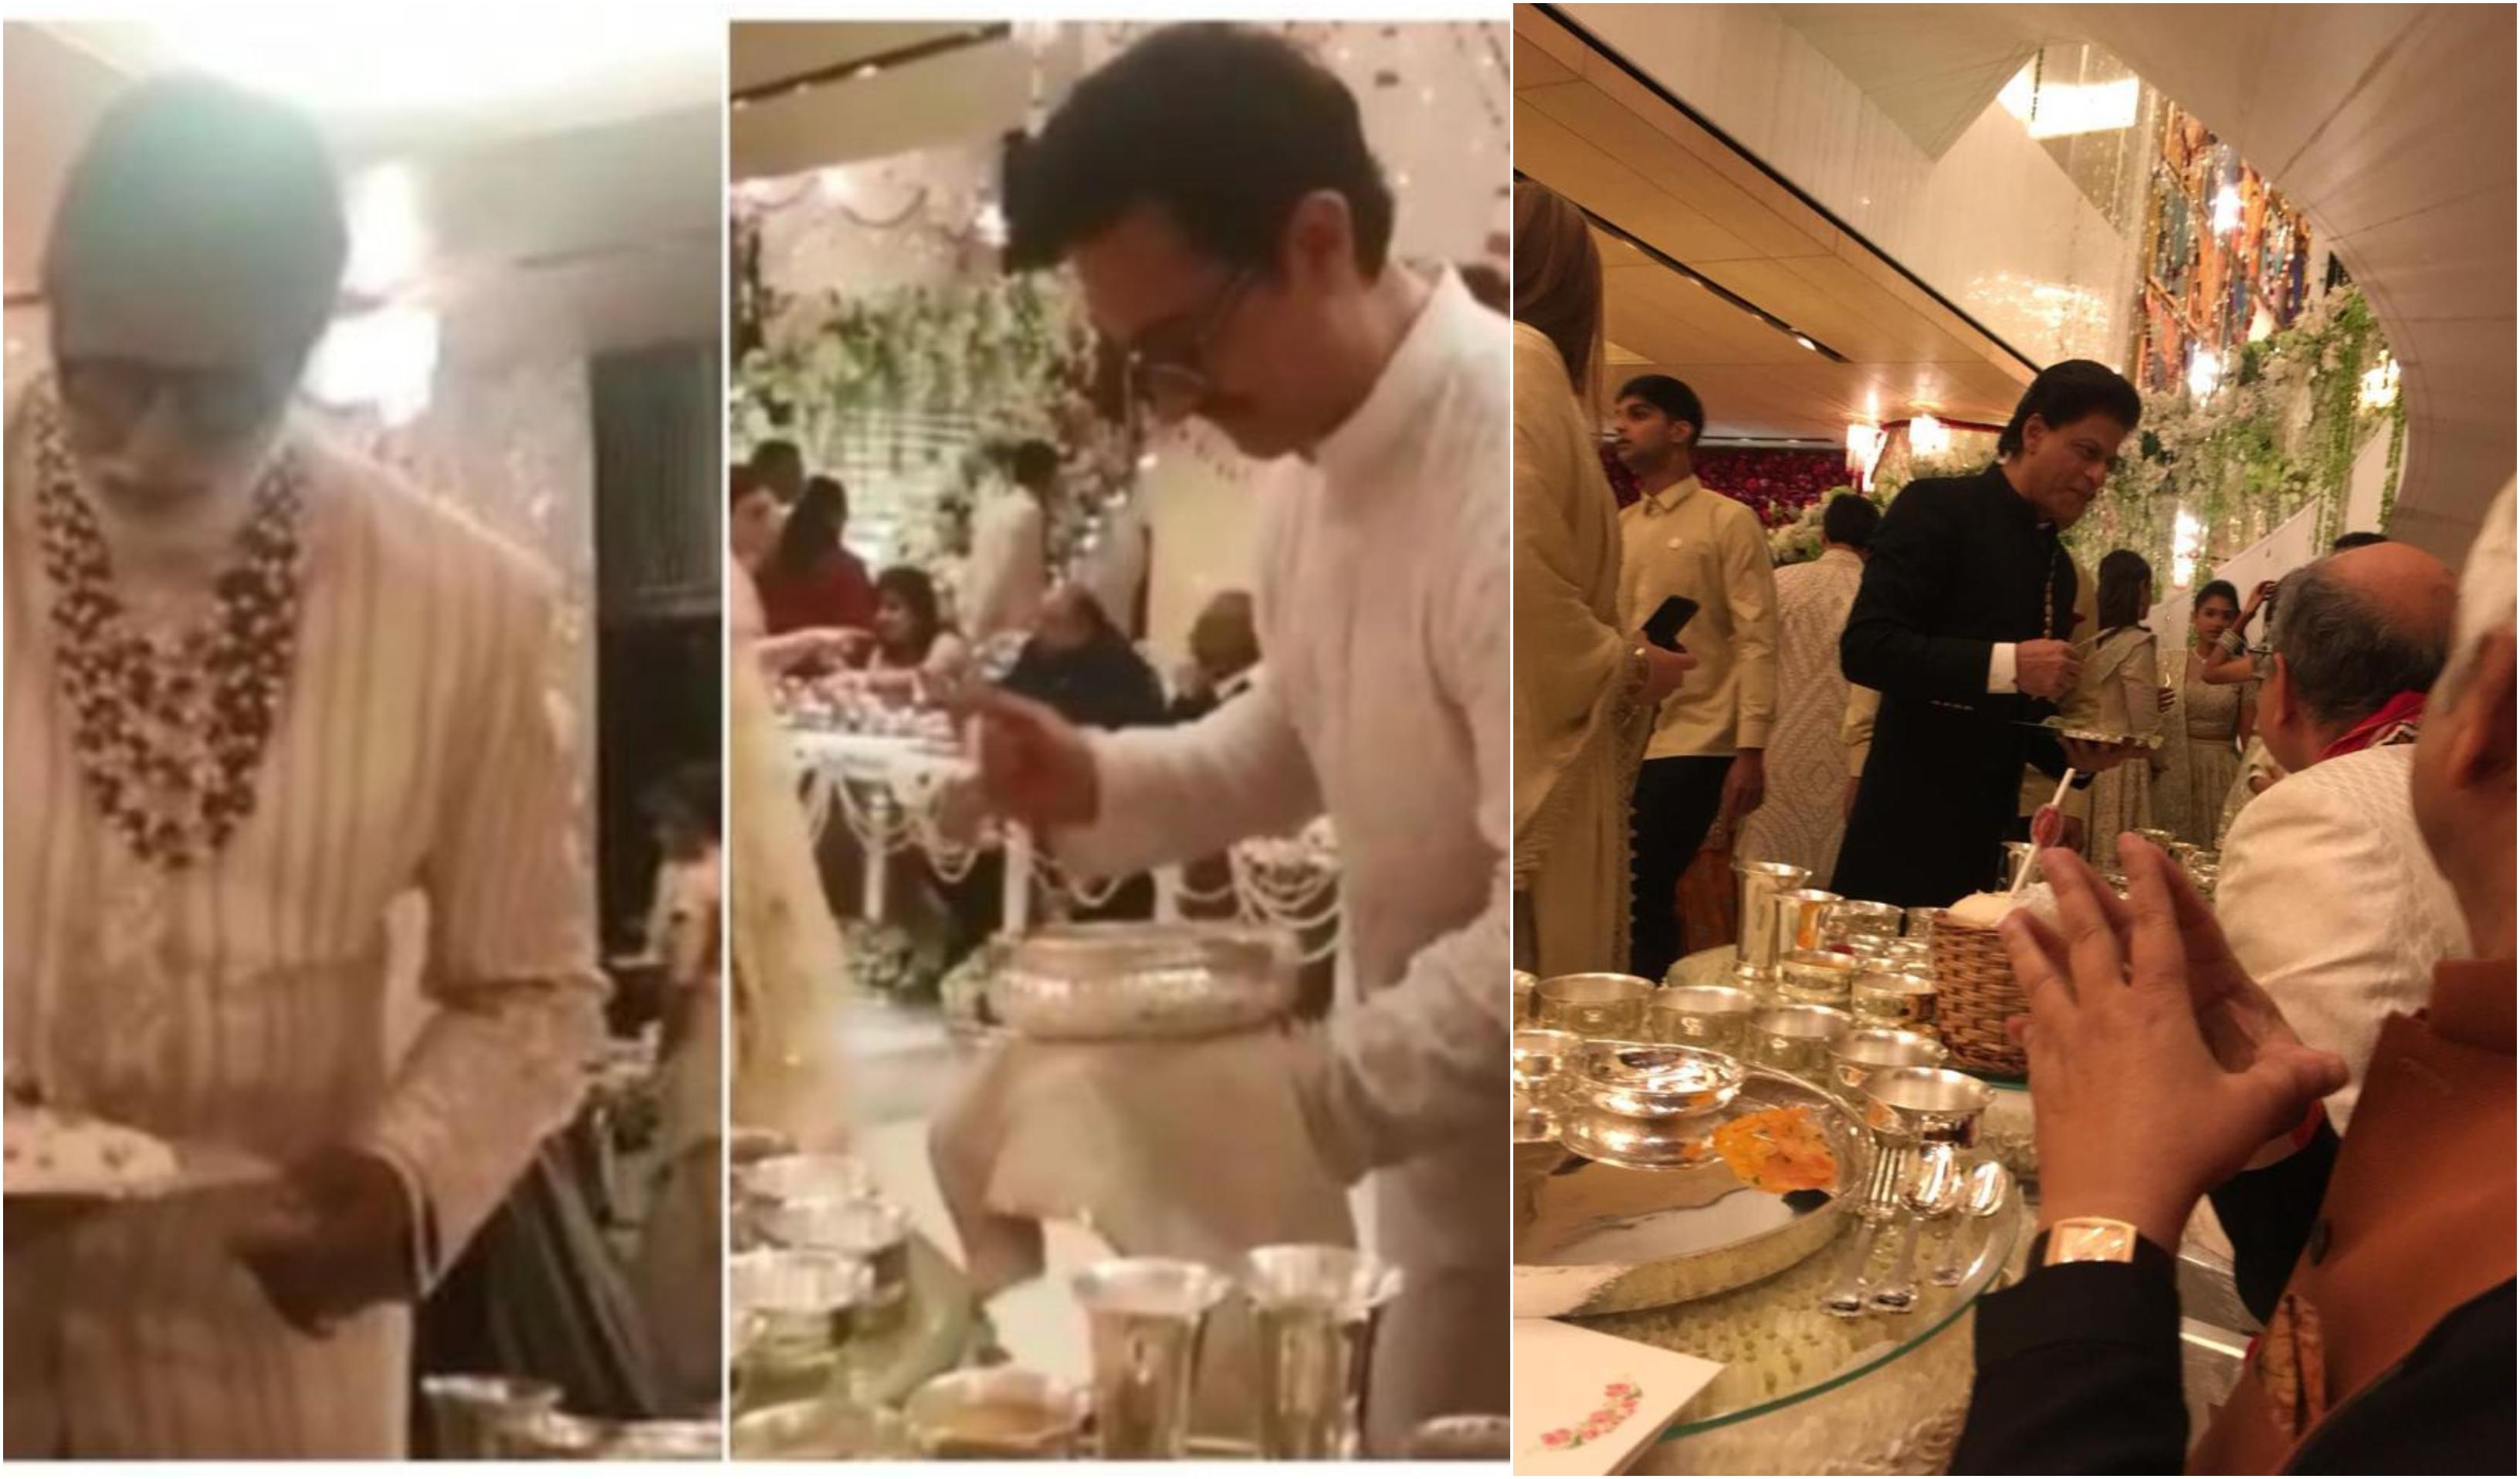 Ambani, Wedding, Mukesh Ambani, Isha Ambani, Anand Piramal, Amitabh Bachchan, Shah Rukh Khan, Aamir Khan, Abhishek Bachchan, Serving, Food, Fact Check, Fact Checker, Fake, NewsMobile, Mobile, News, India